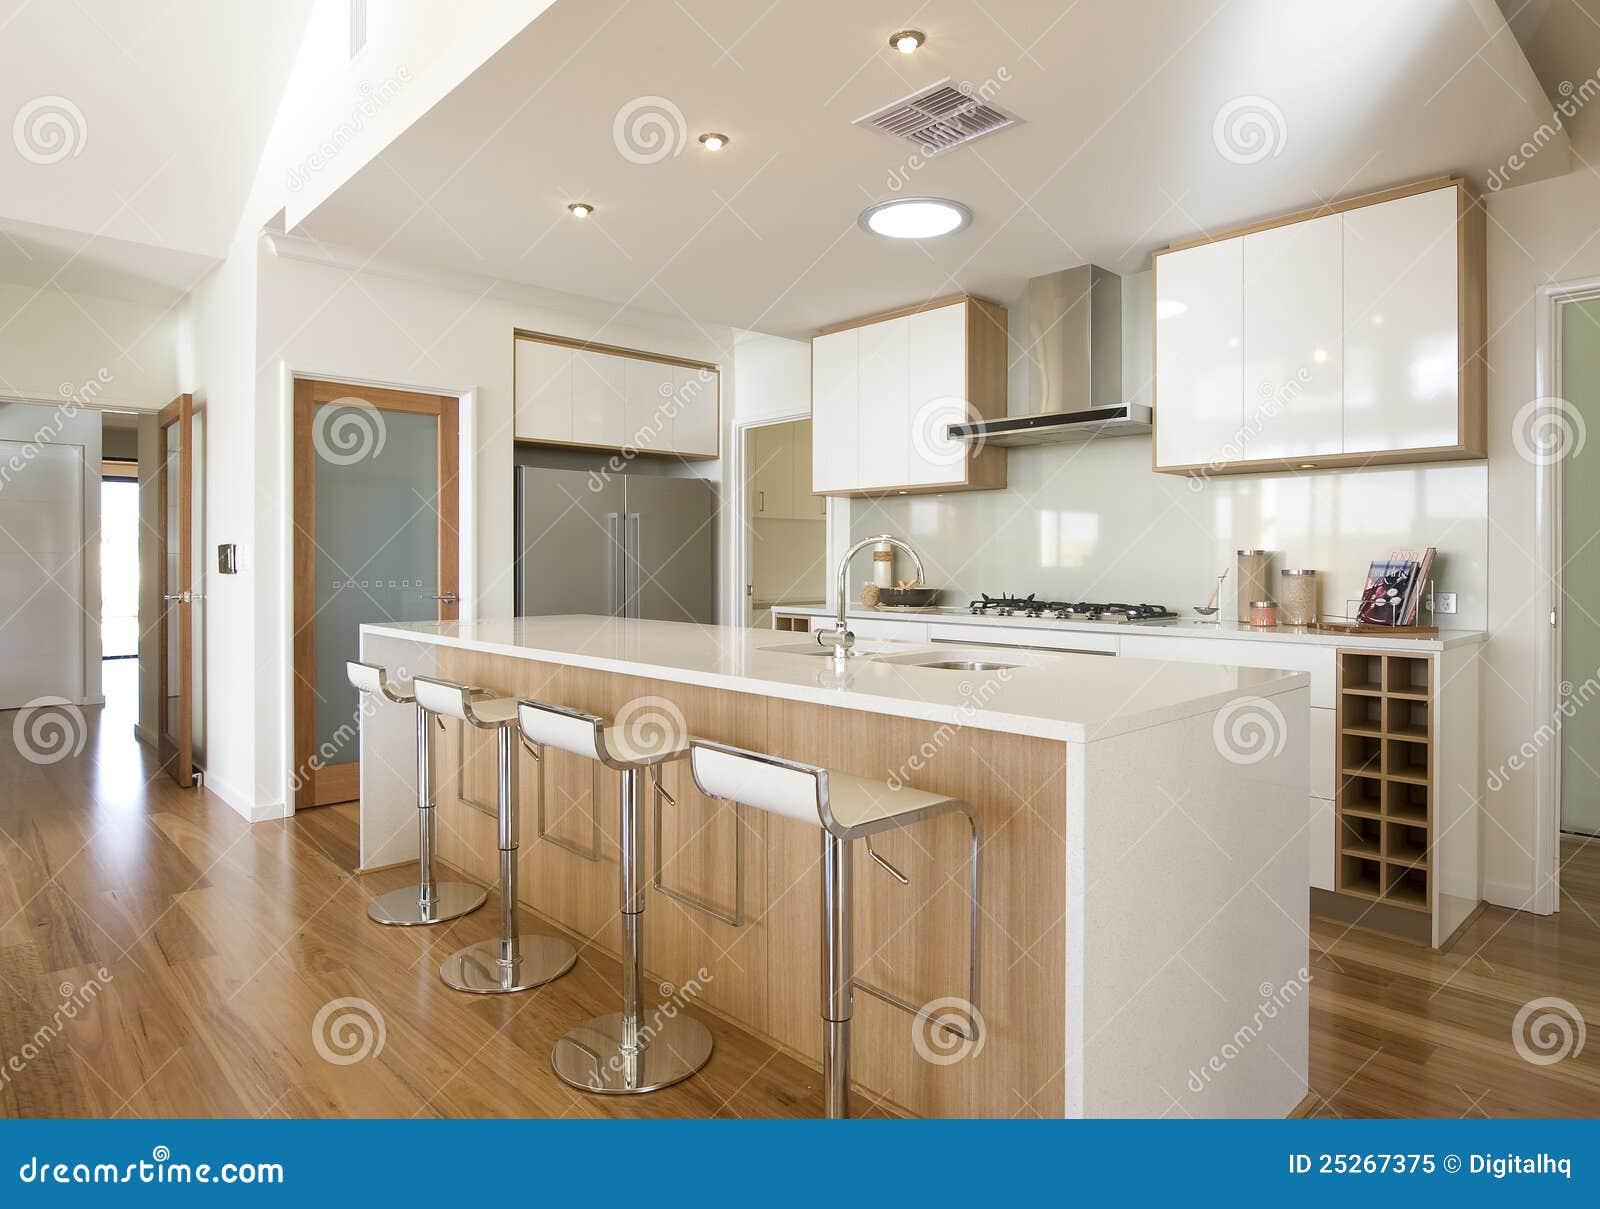 Fabulous Galley Kitchen Designs 1300 x 999 · 122 kB · jpeg